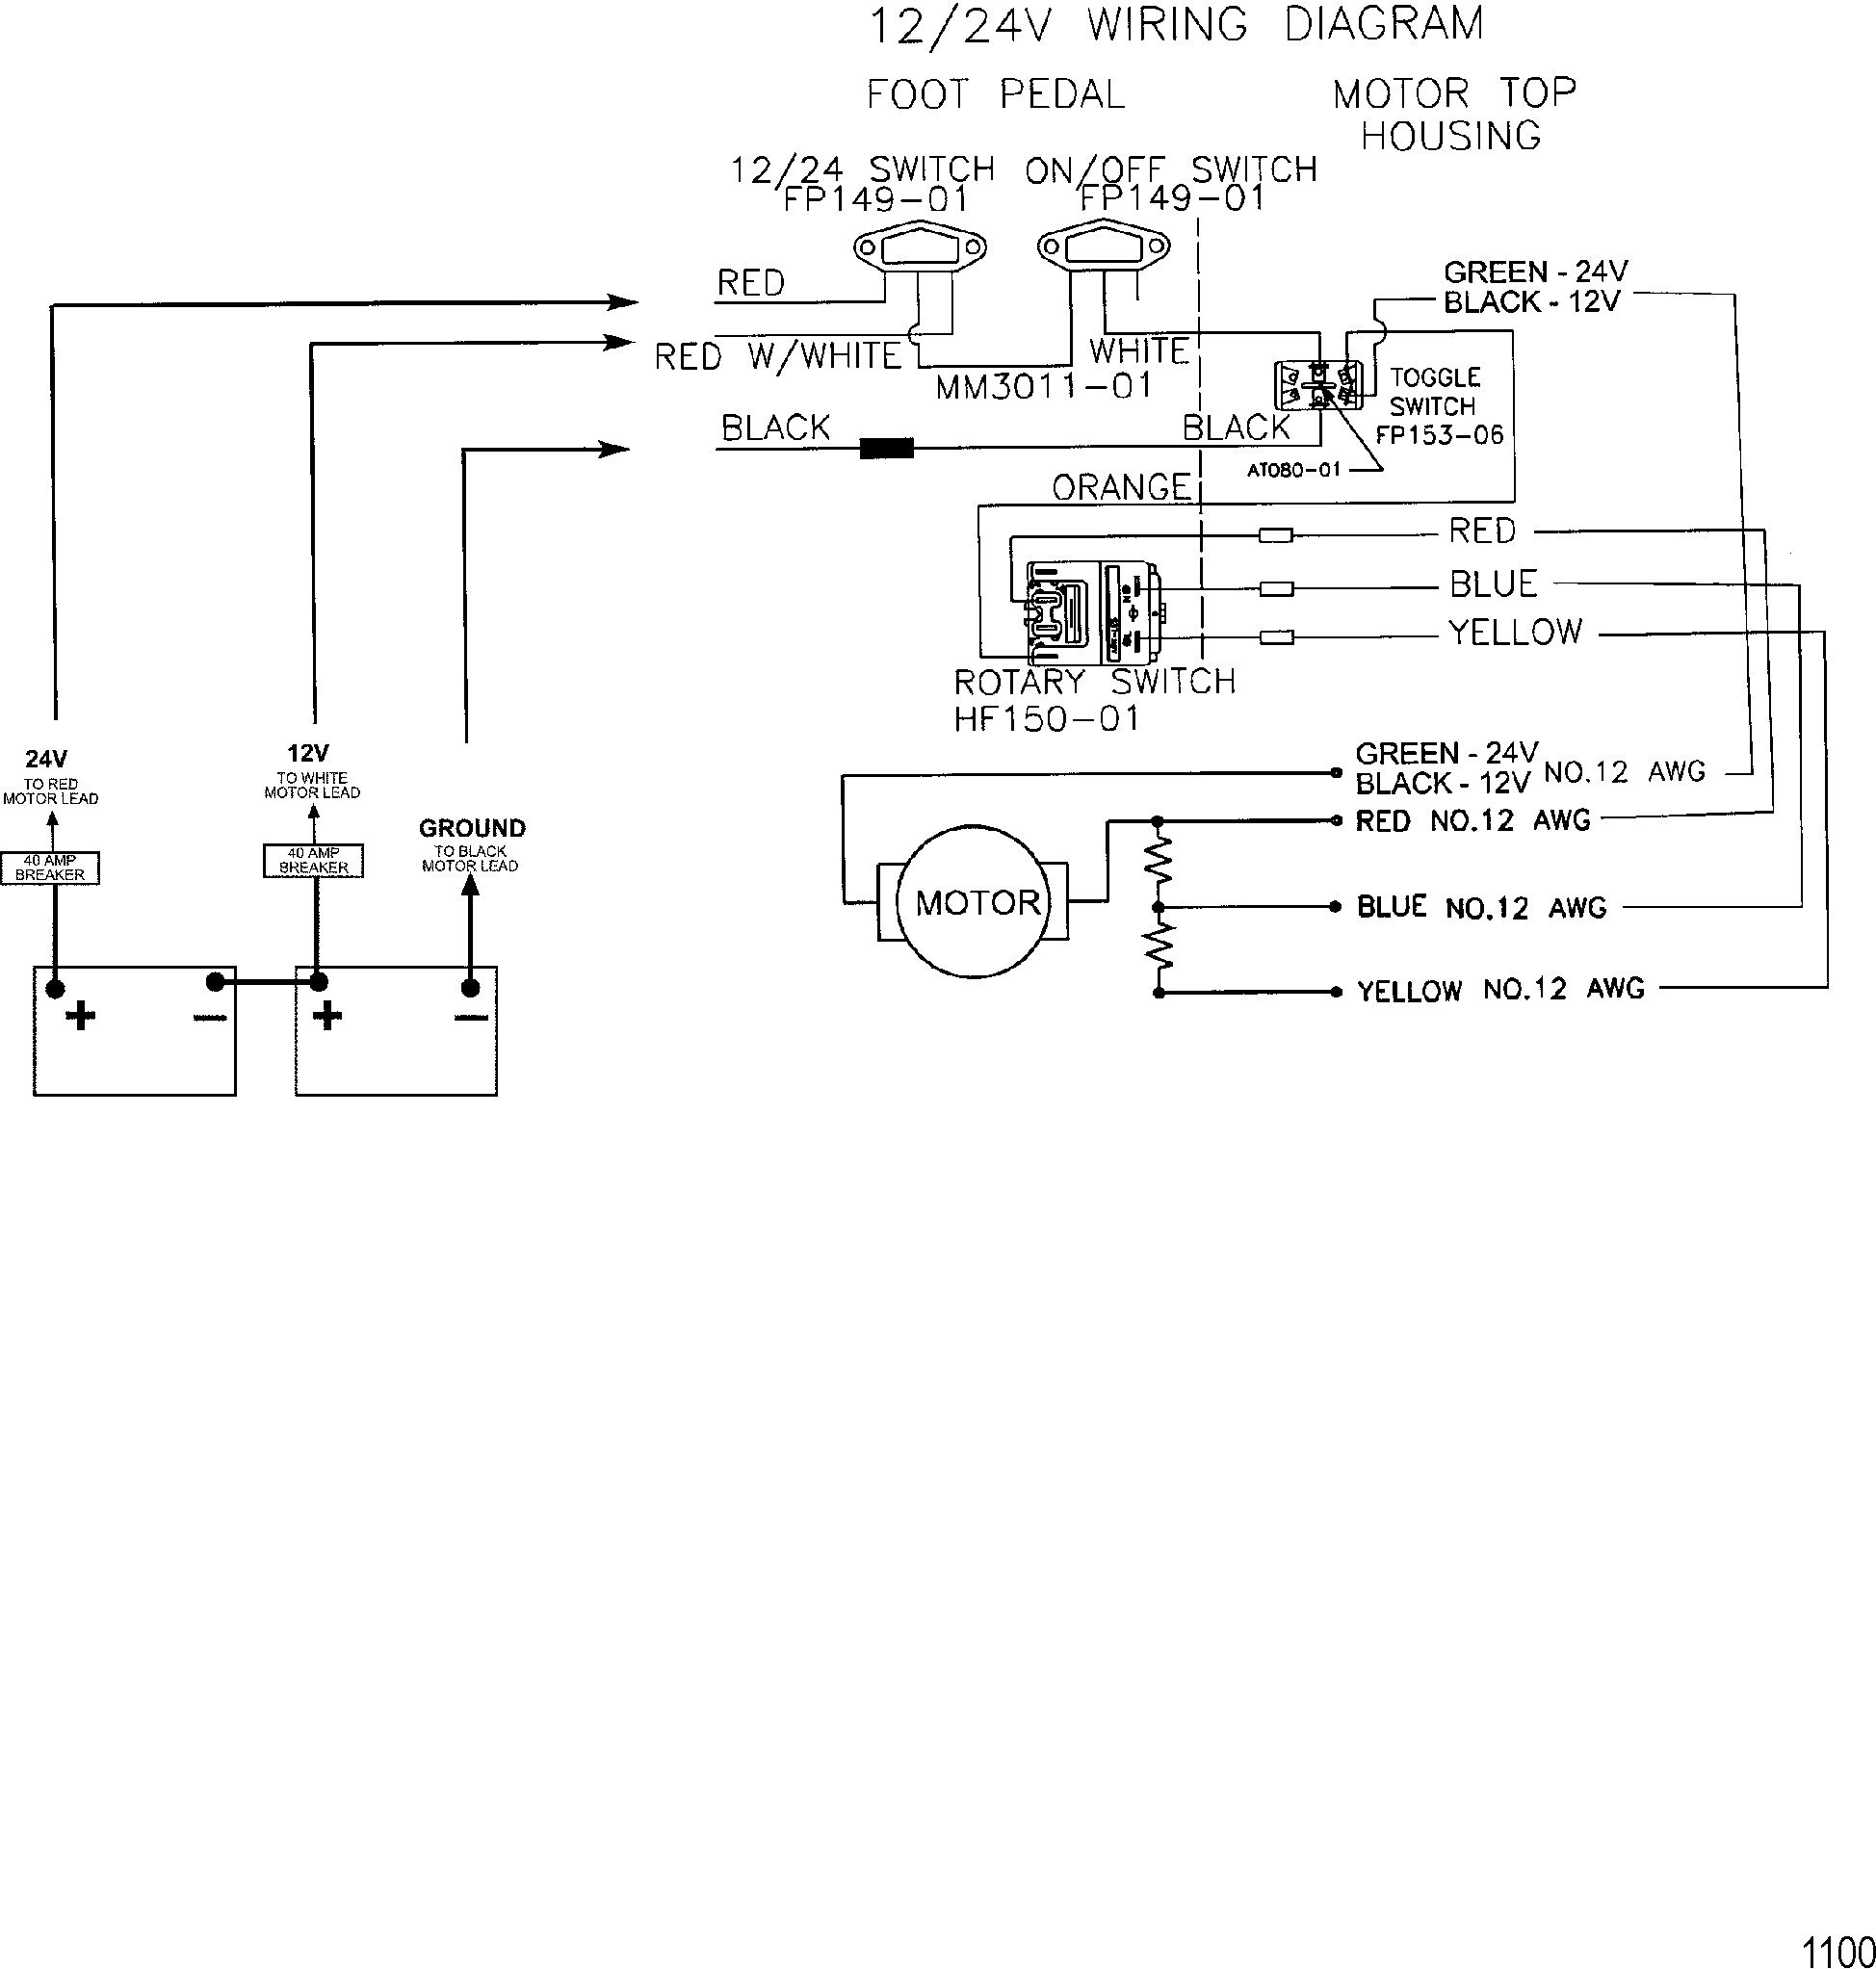 hight resolution of omc trolling motor wiring diagram 11 10 fearless wonder de u2022omc trolling motor wiring diagram